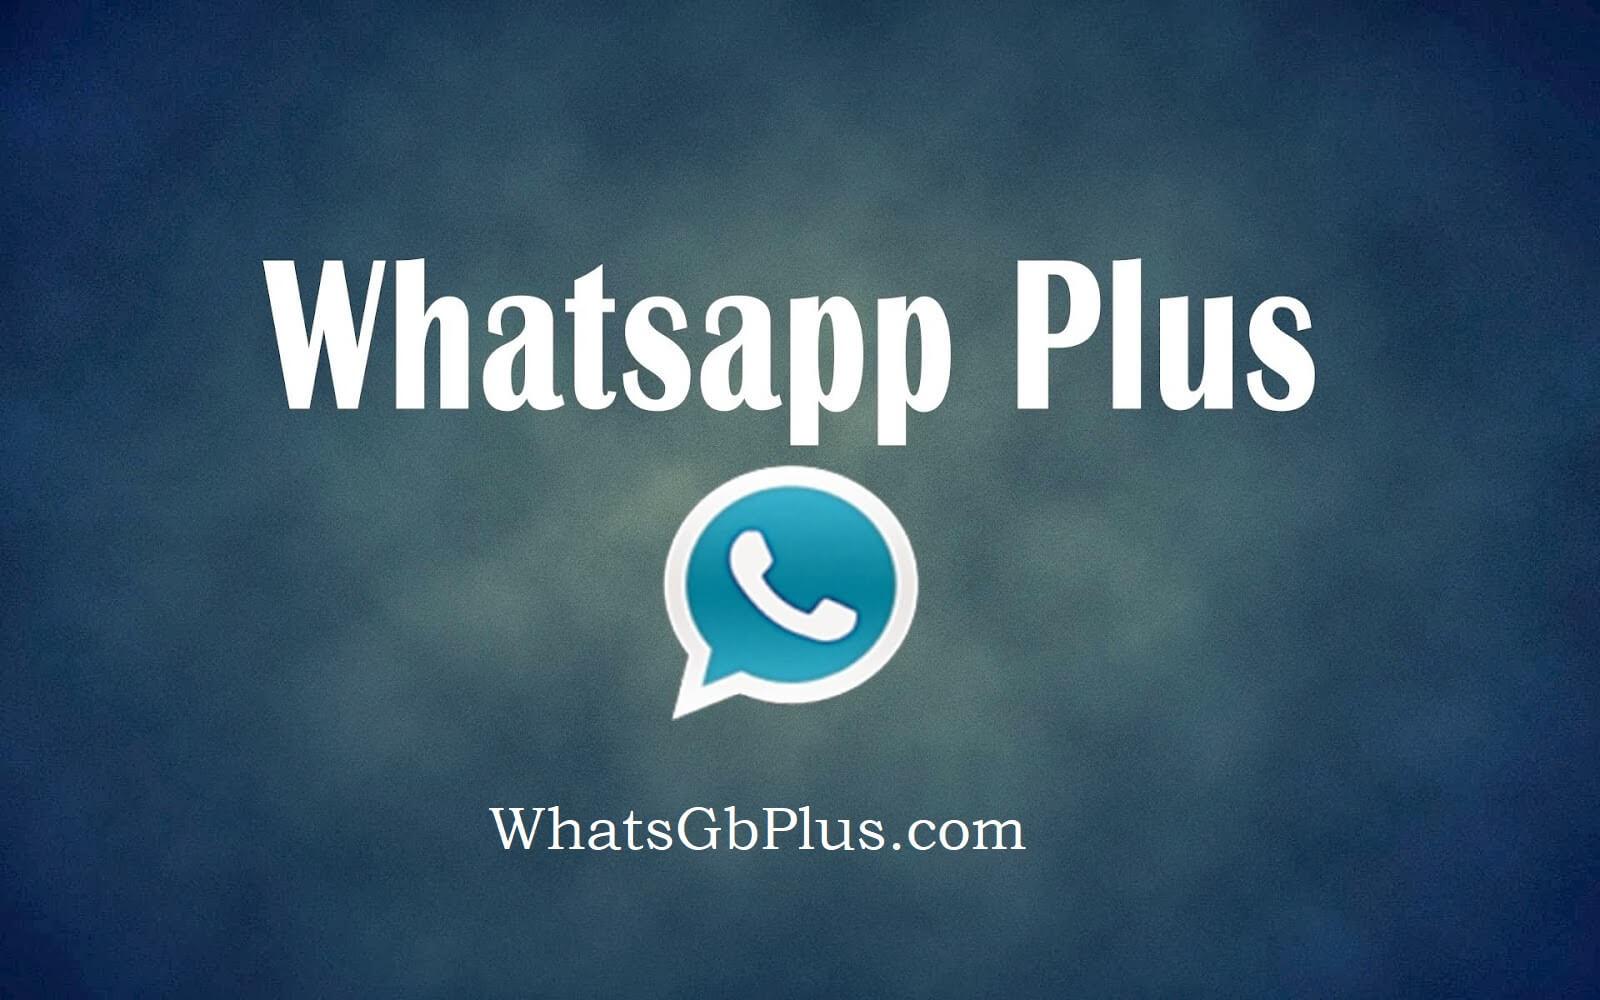 whatsapp plus and GB whatsapp banned